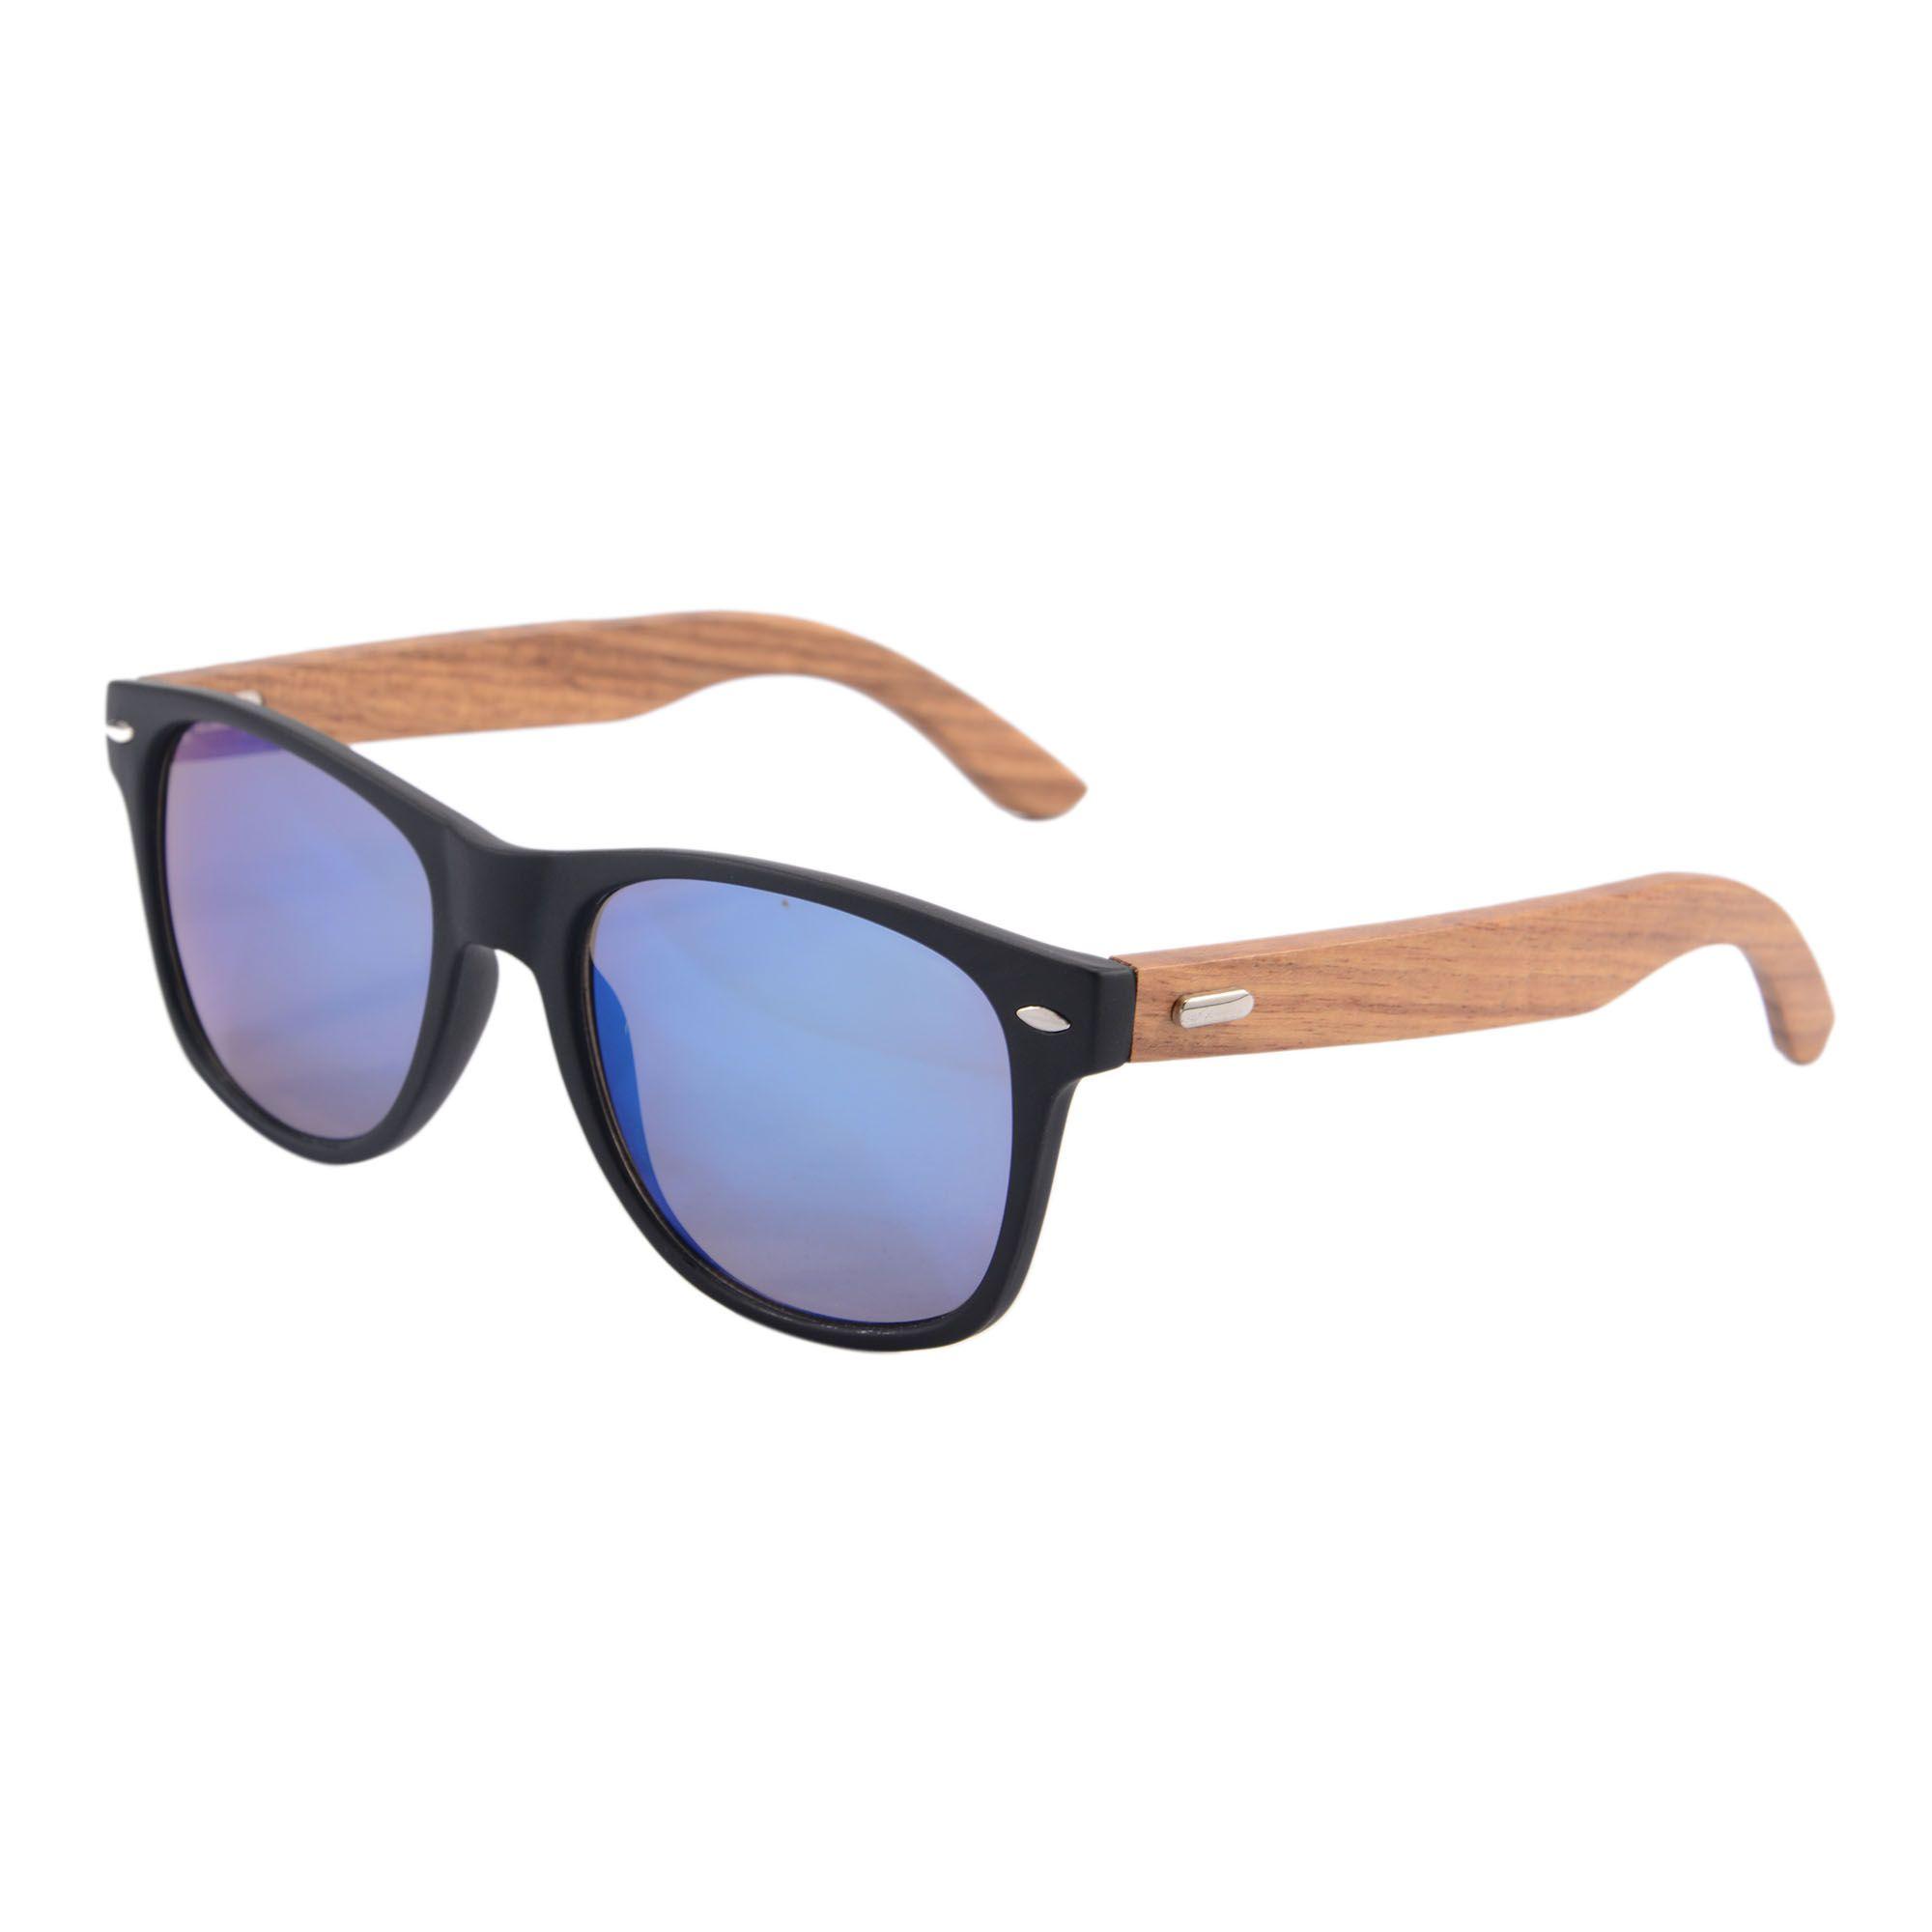 73a212e0ce Sunglasses PC Frame Wood Temple Women Men Brand Designer 2015 Coating Sunglass  High Quality 6026 Victoria Beckham Sunglasses Prescription Glasses Online  ...